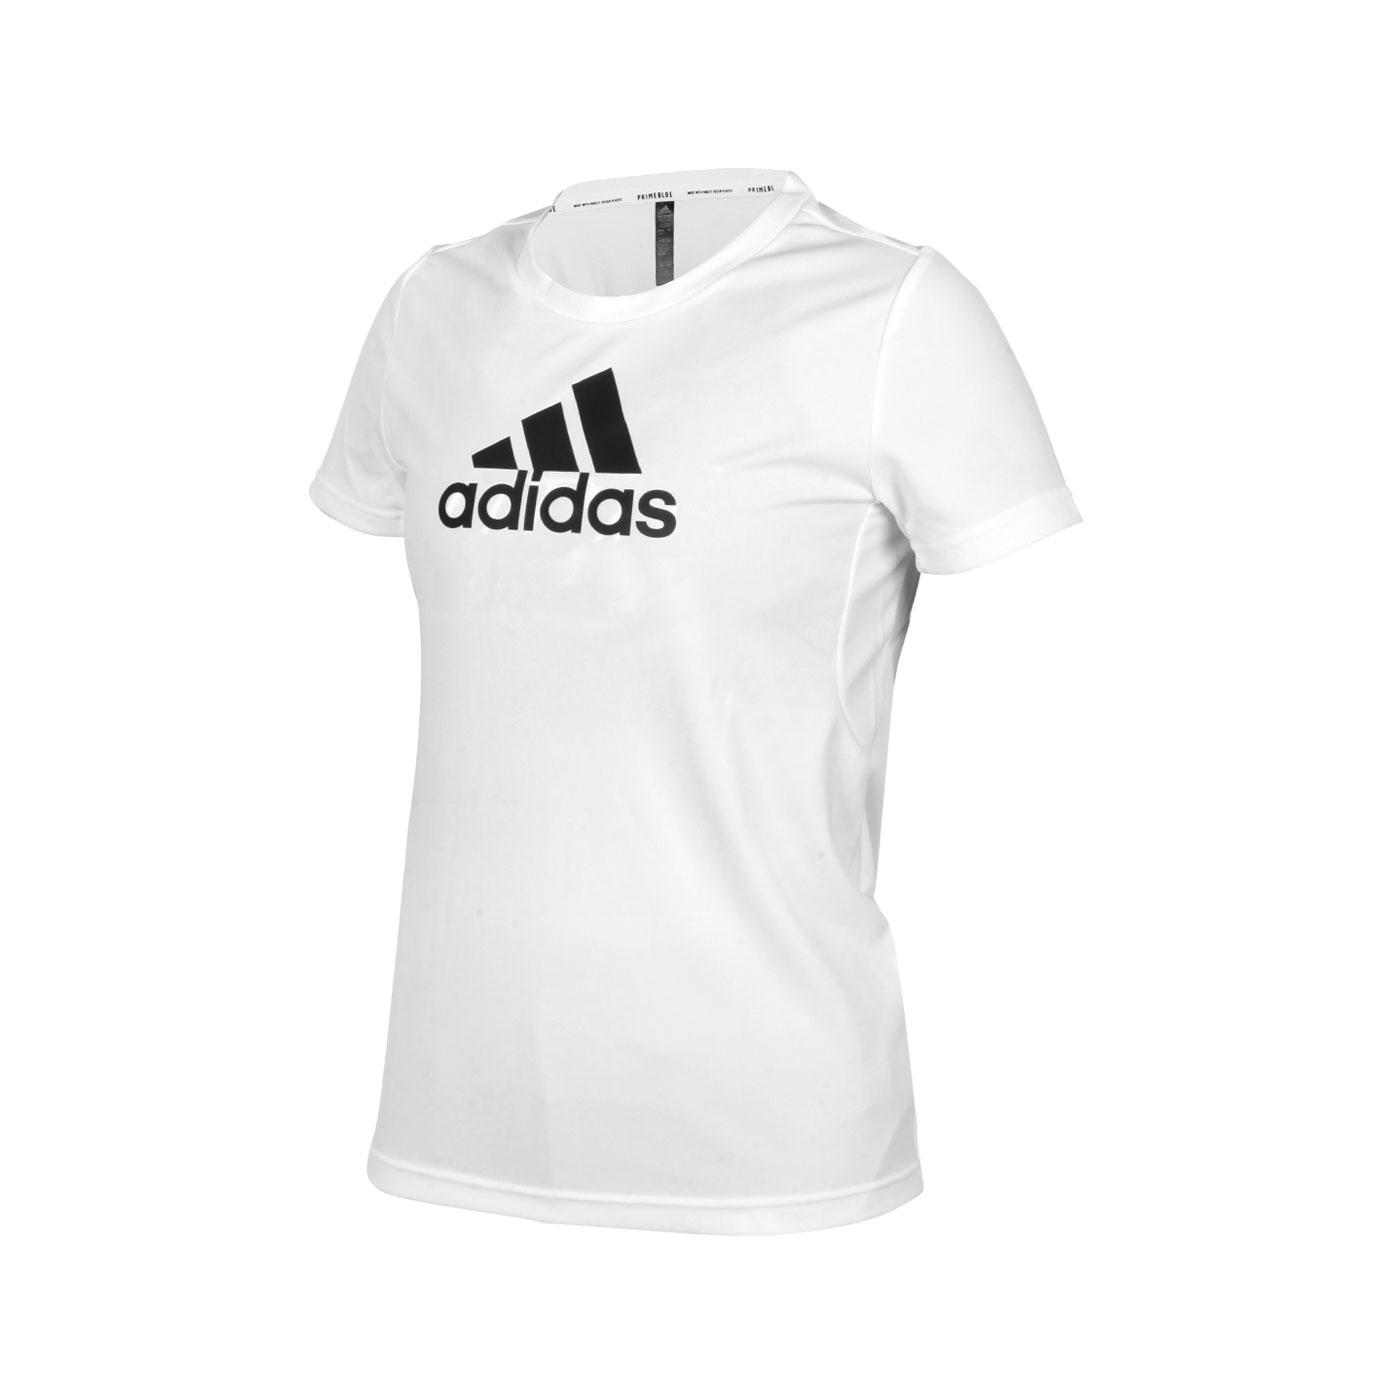 ADIDAS 女款短袖T恤 GL3821